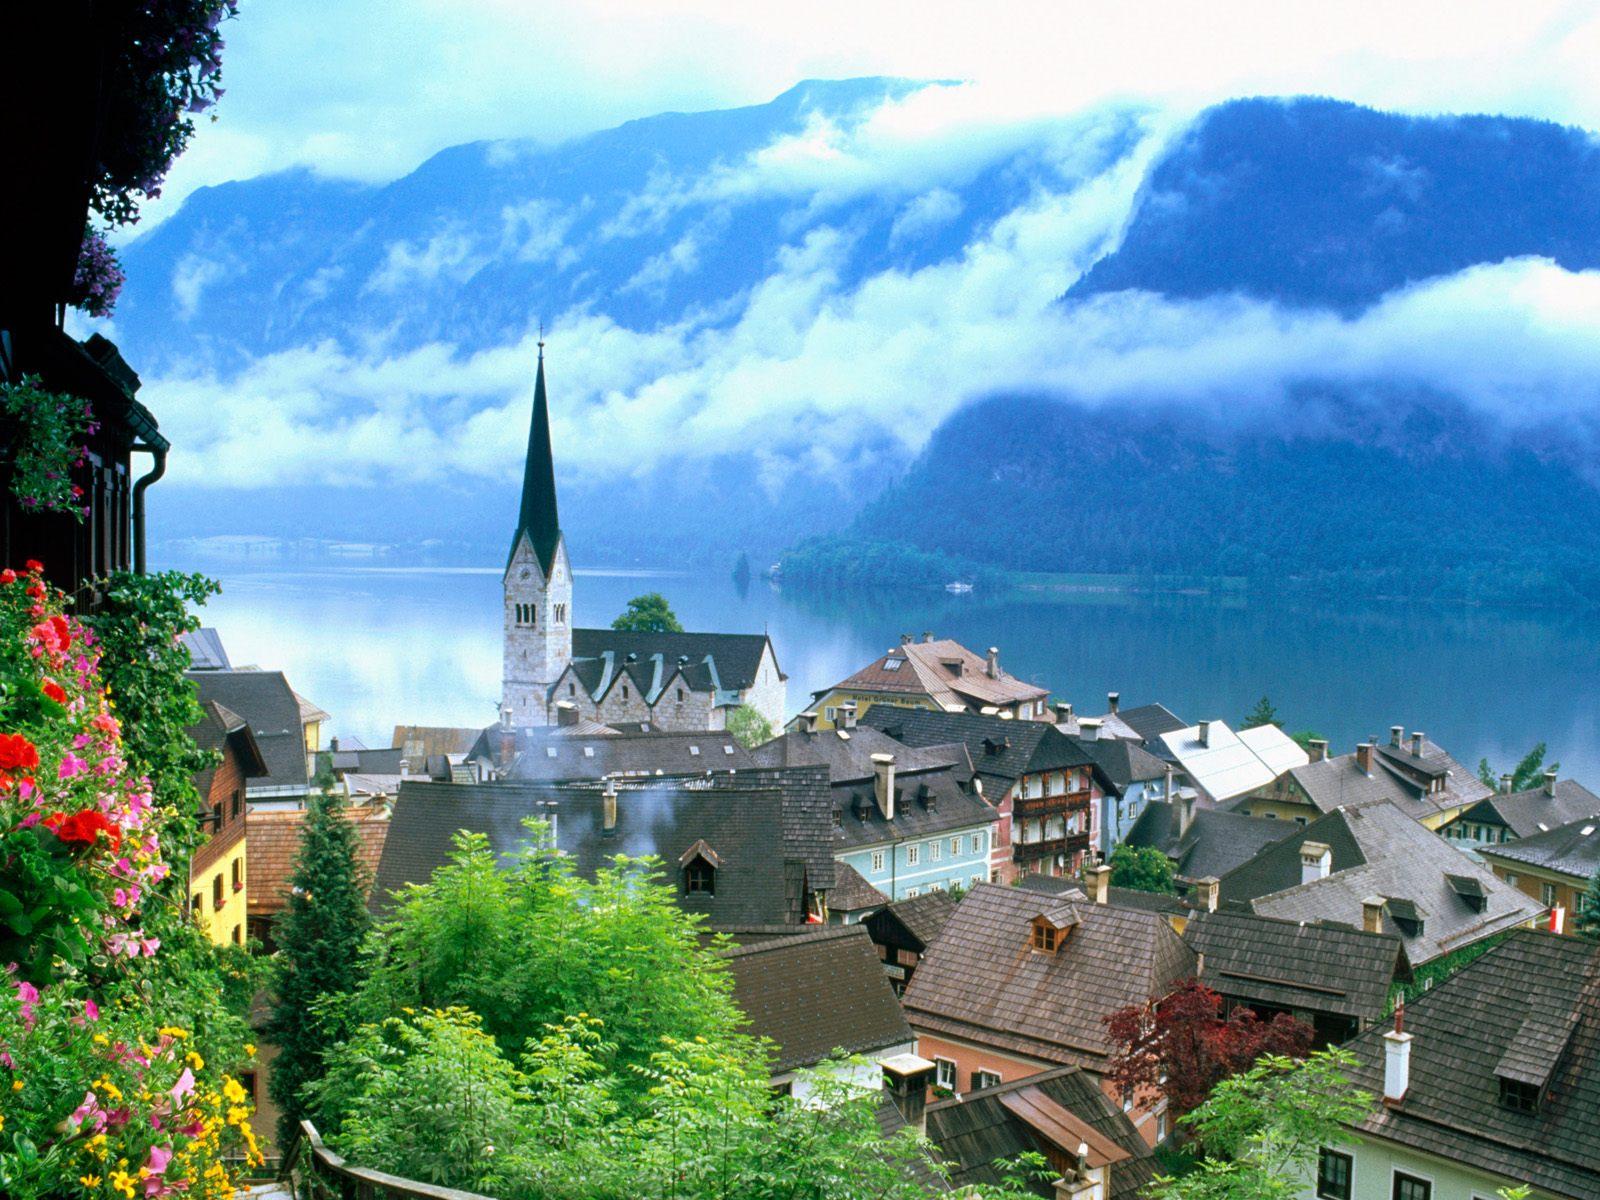 http://1.bp.blogspot.com/-rU-9ae2IDRo/TonLdVuhXTI/AAAAAAAAAZA/KXAfyO1XYfE/s1600/Salzkammergut%252C+Austria.jpg